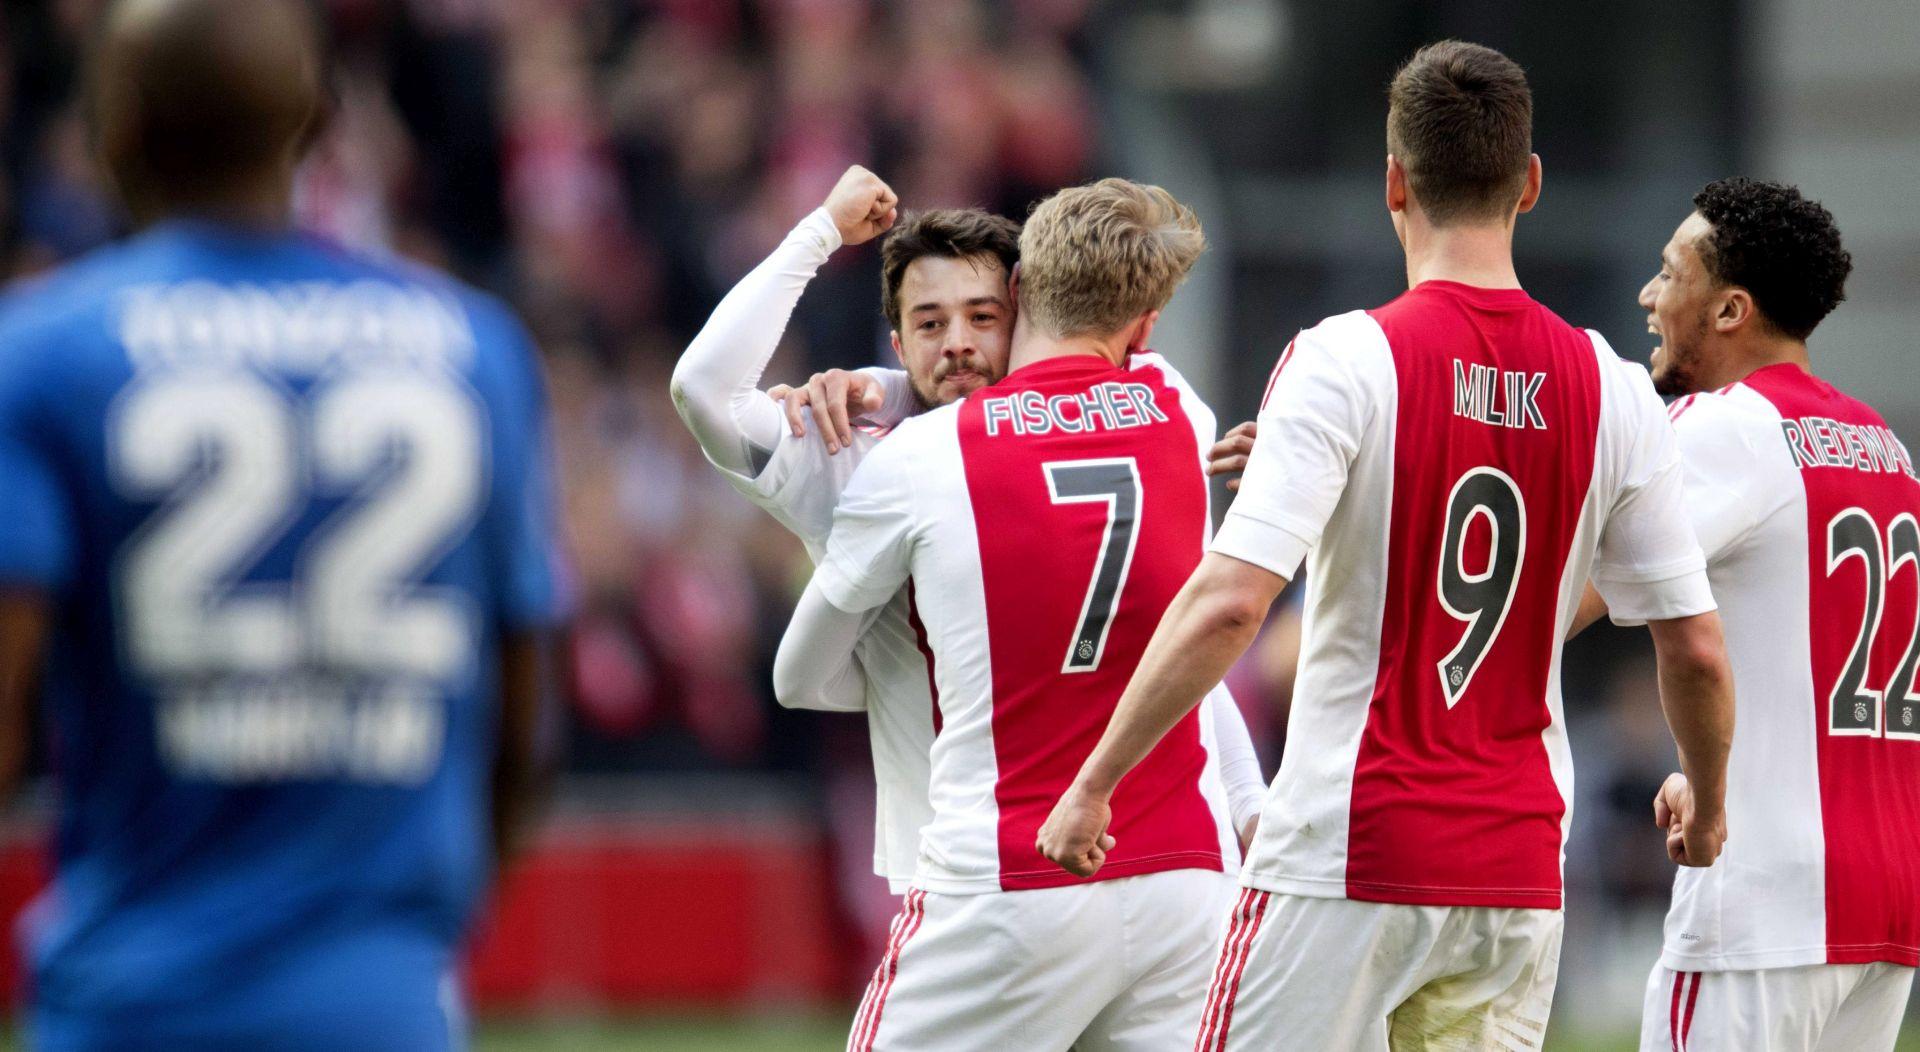 AJAX BEZ TRENERA Frank de Boer podnio ostavku